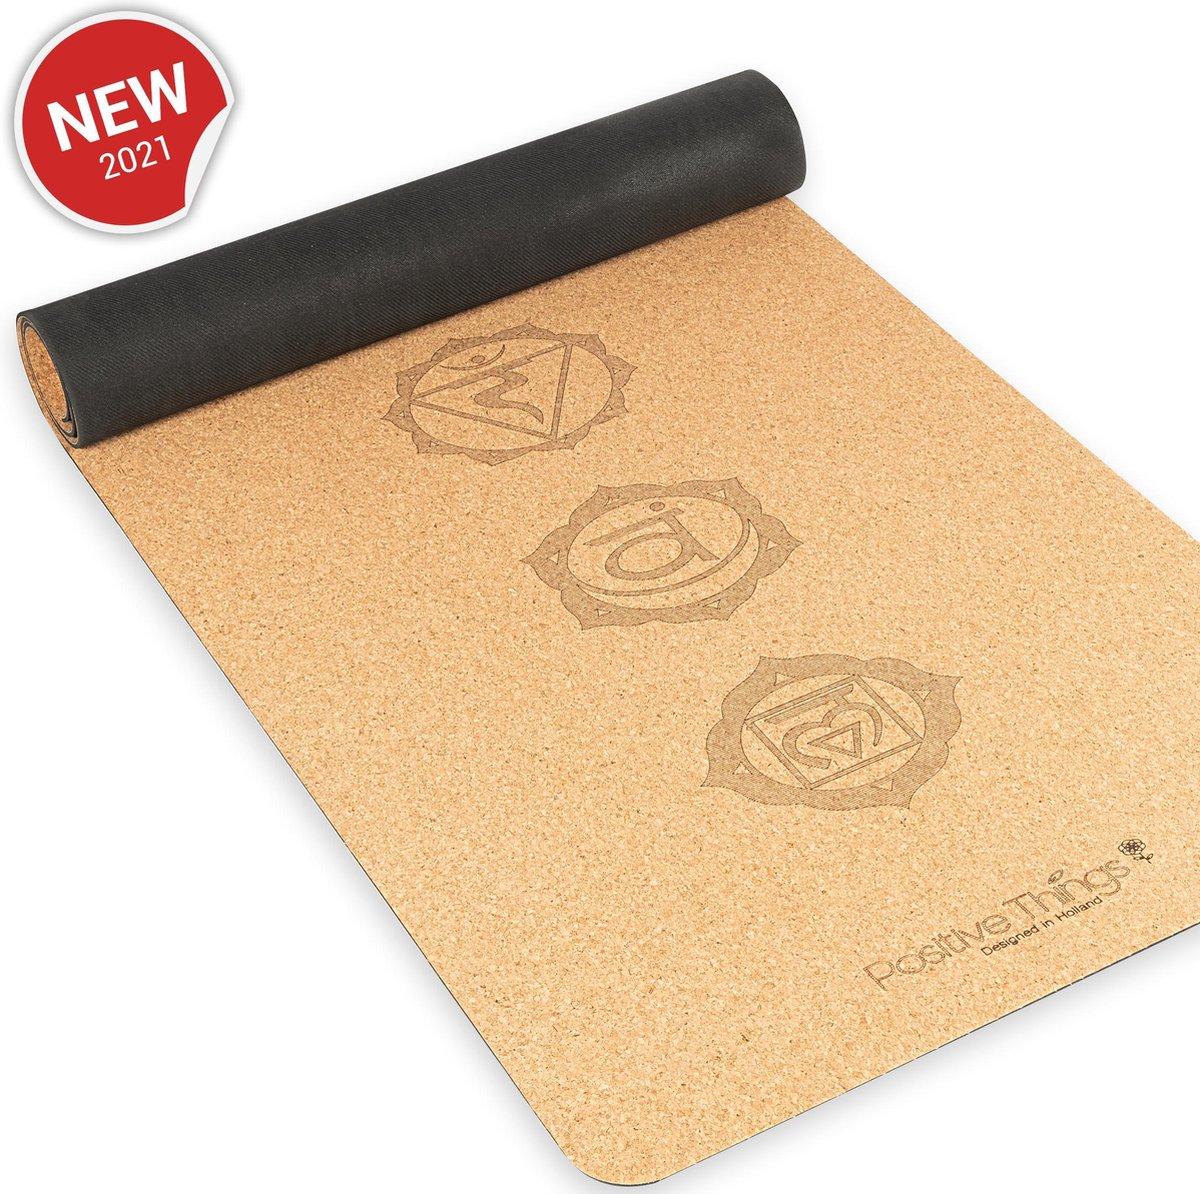 Positive Things Yoga mat   100% Natuurvriendelijke Kurk Yoga mat met anti slip   Workout mat - Fitne